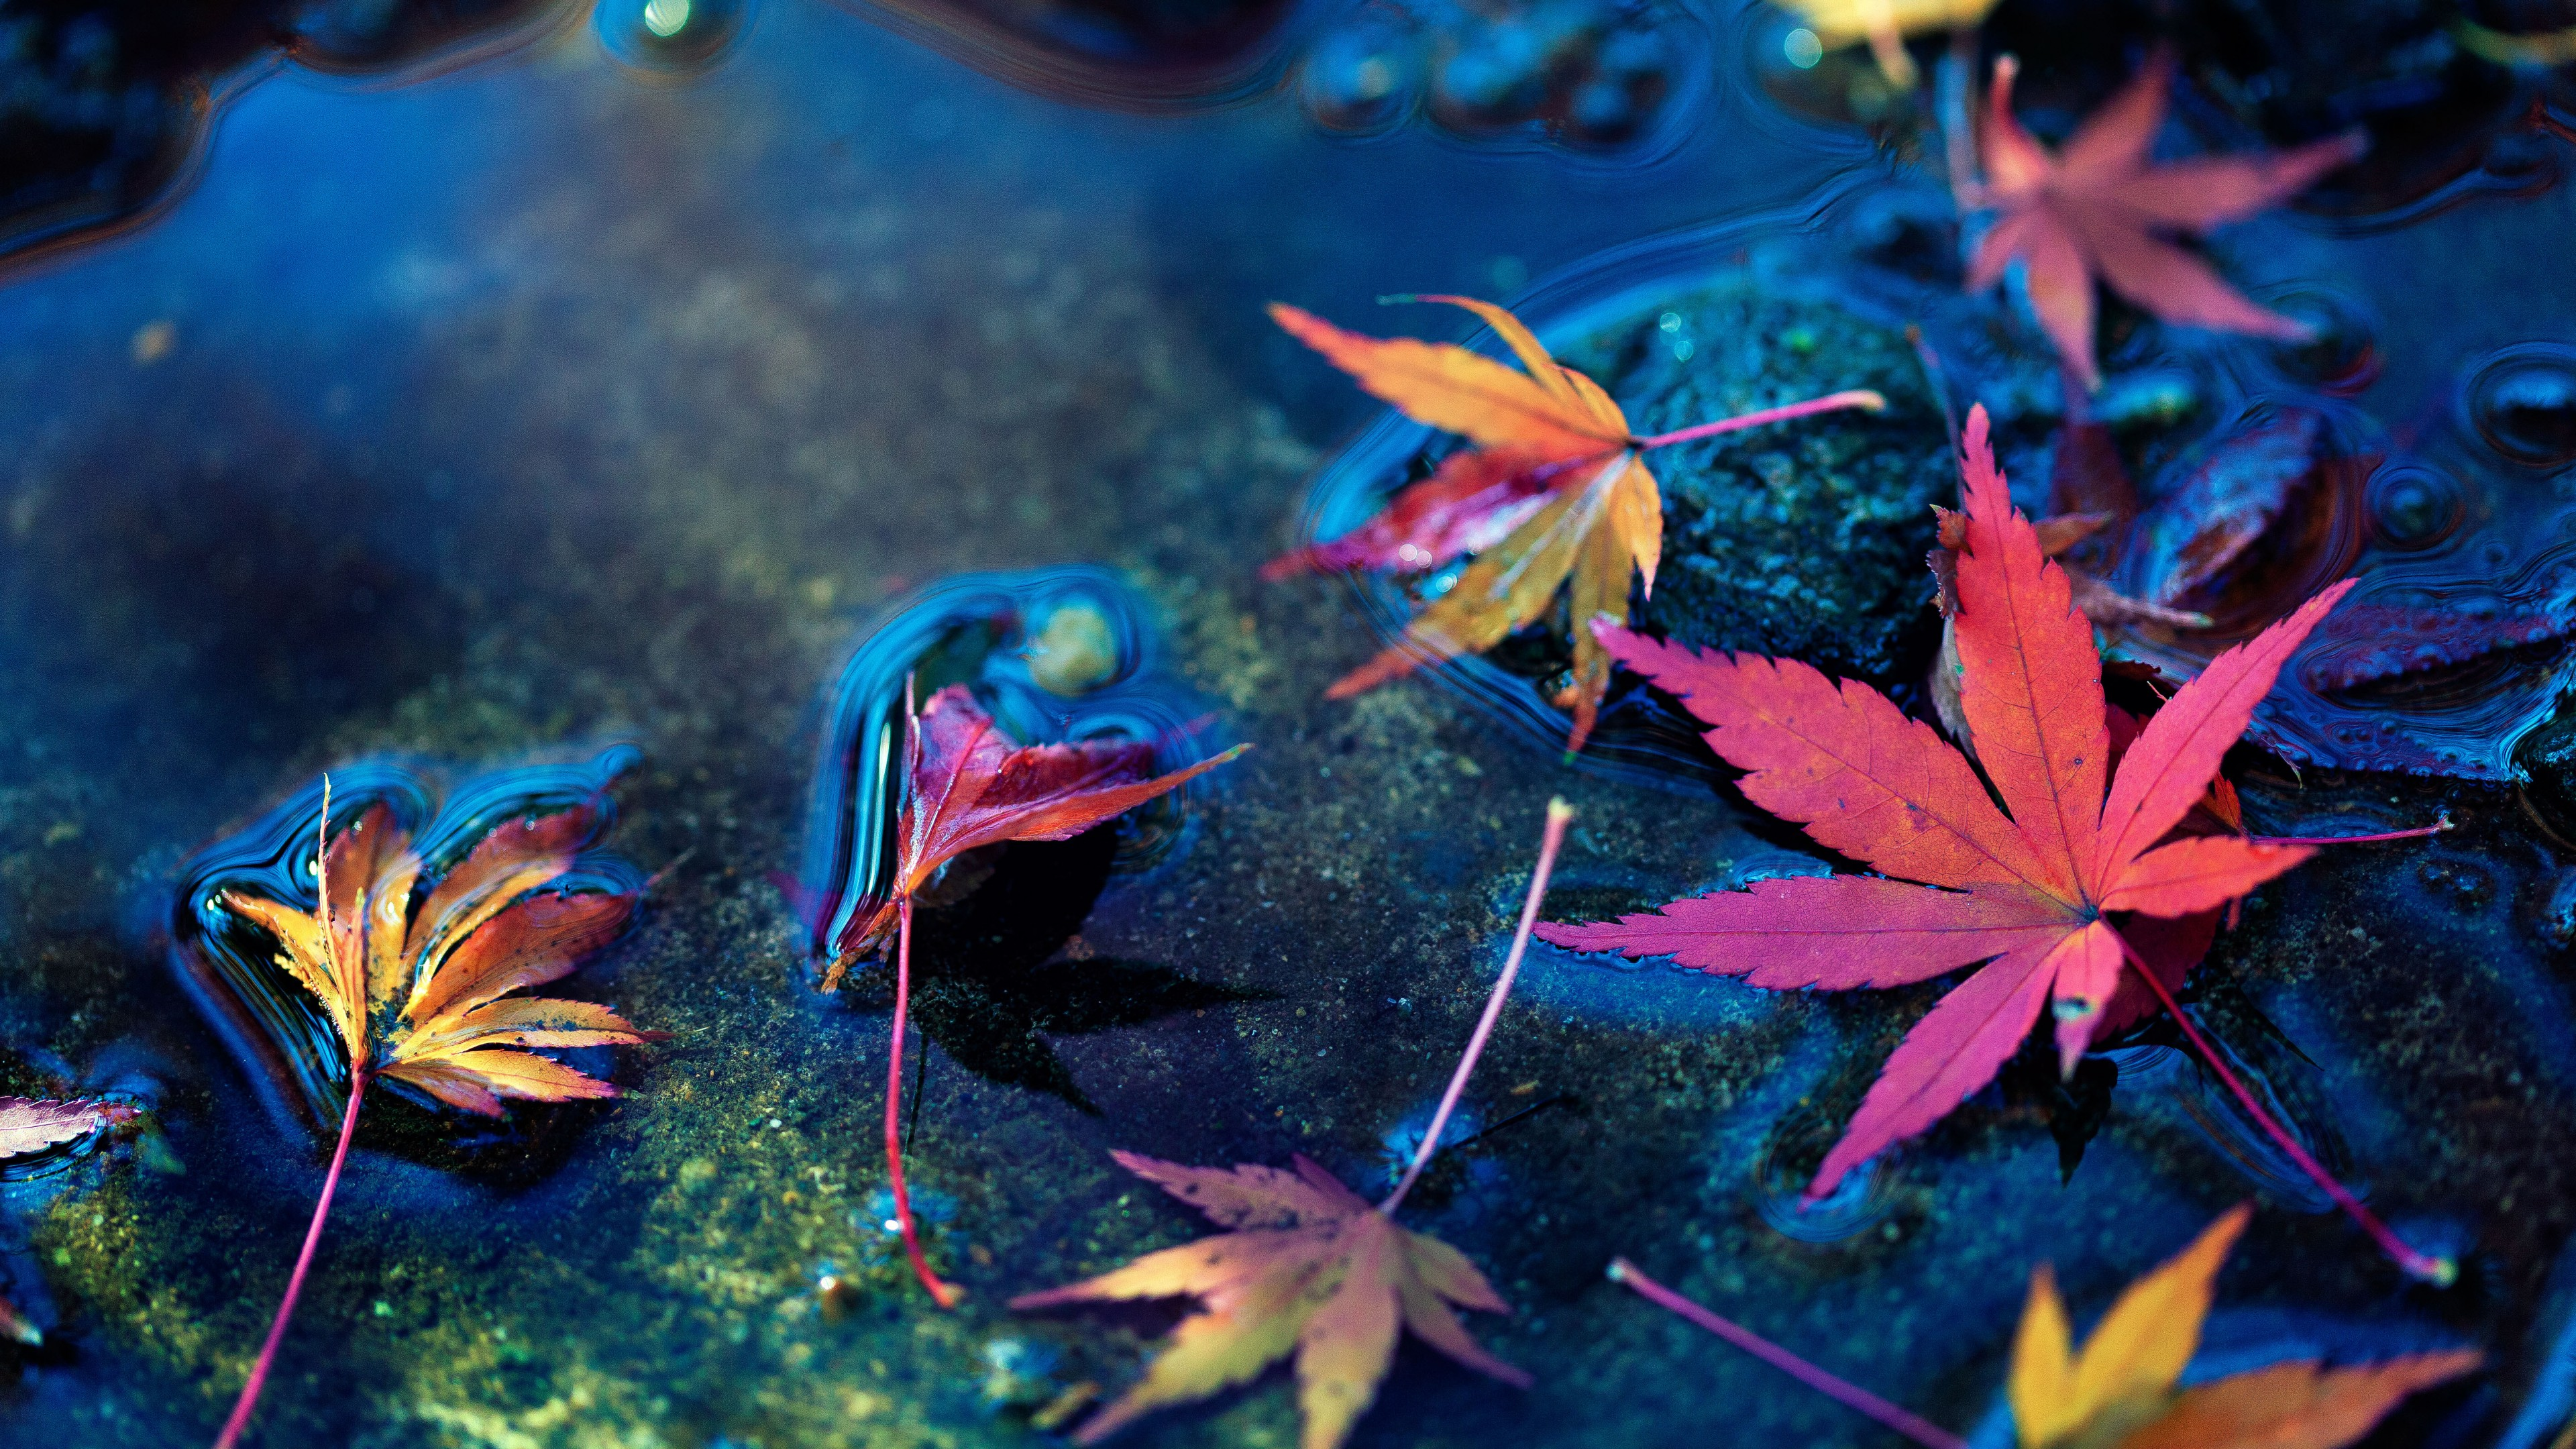 maple leafs 1574937776 - Maple Leafs -